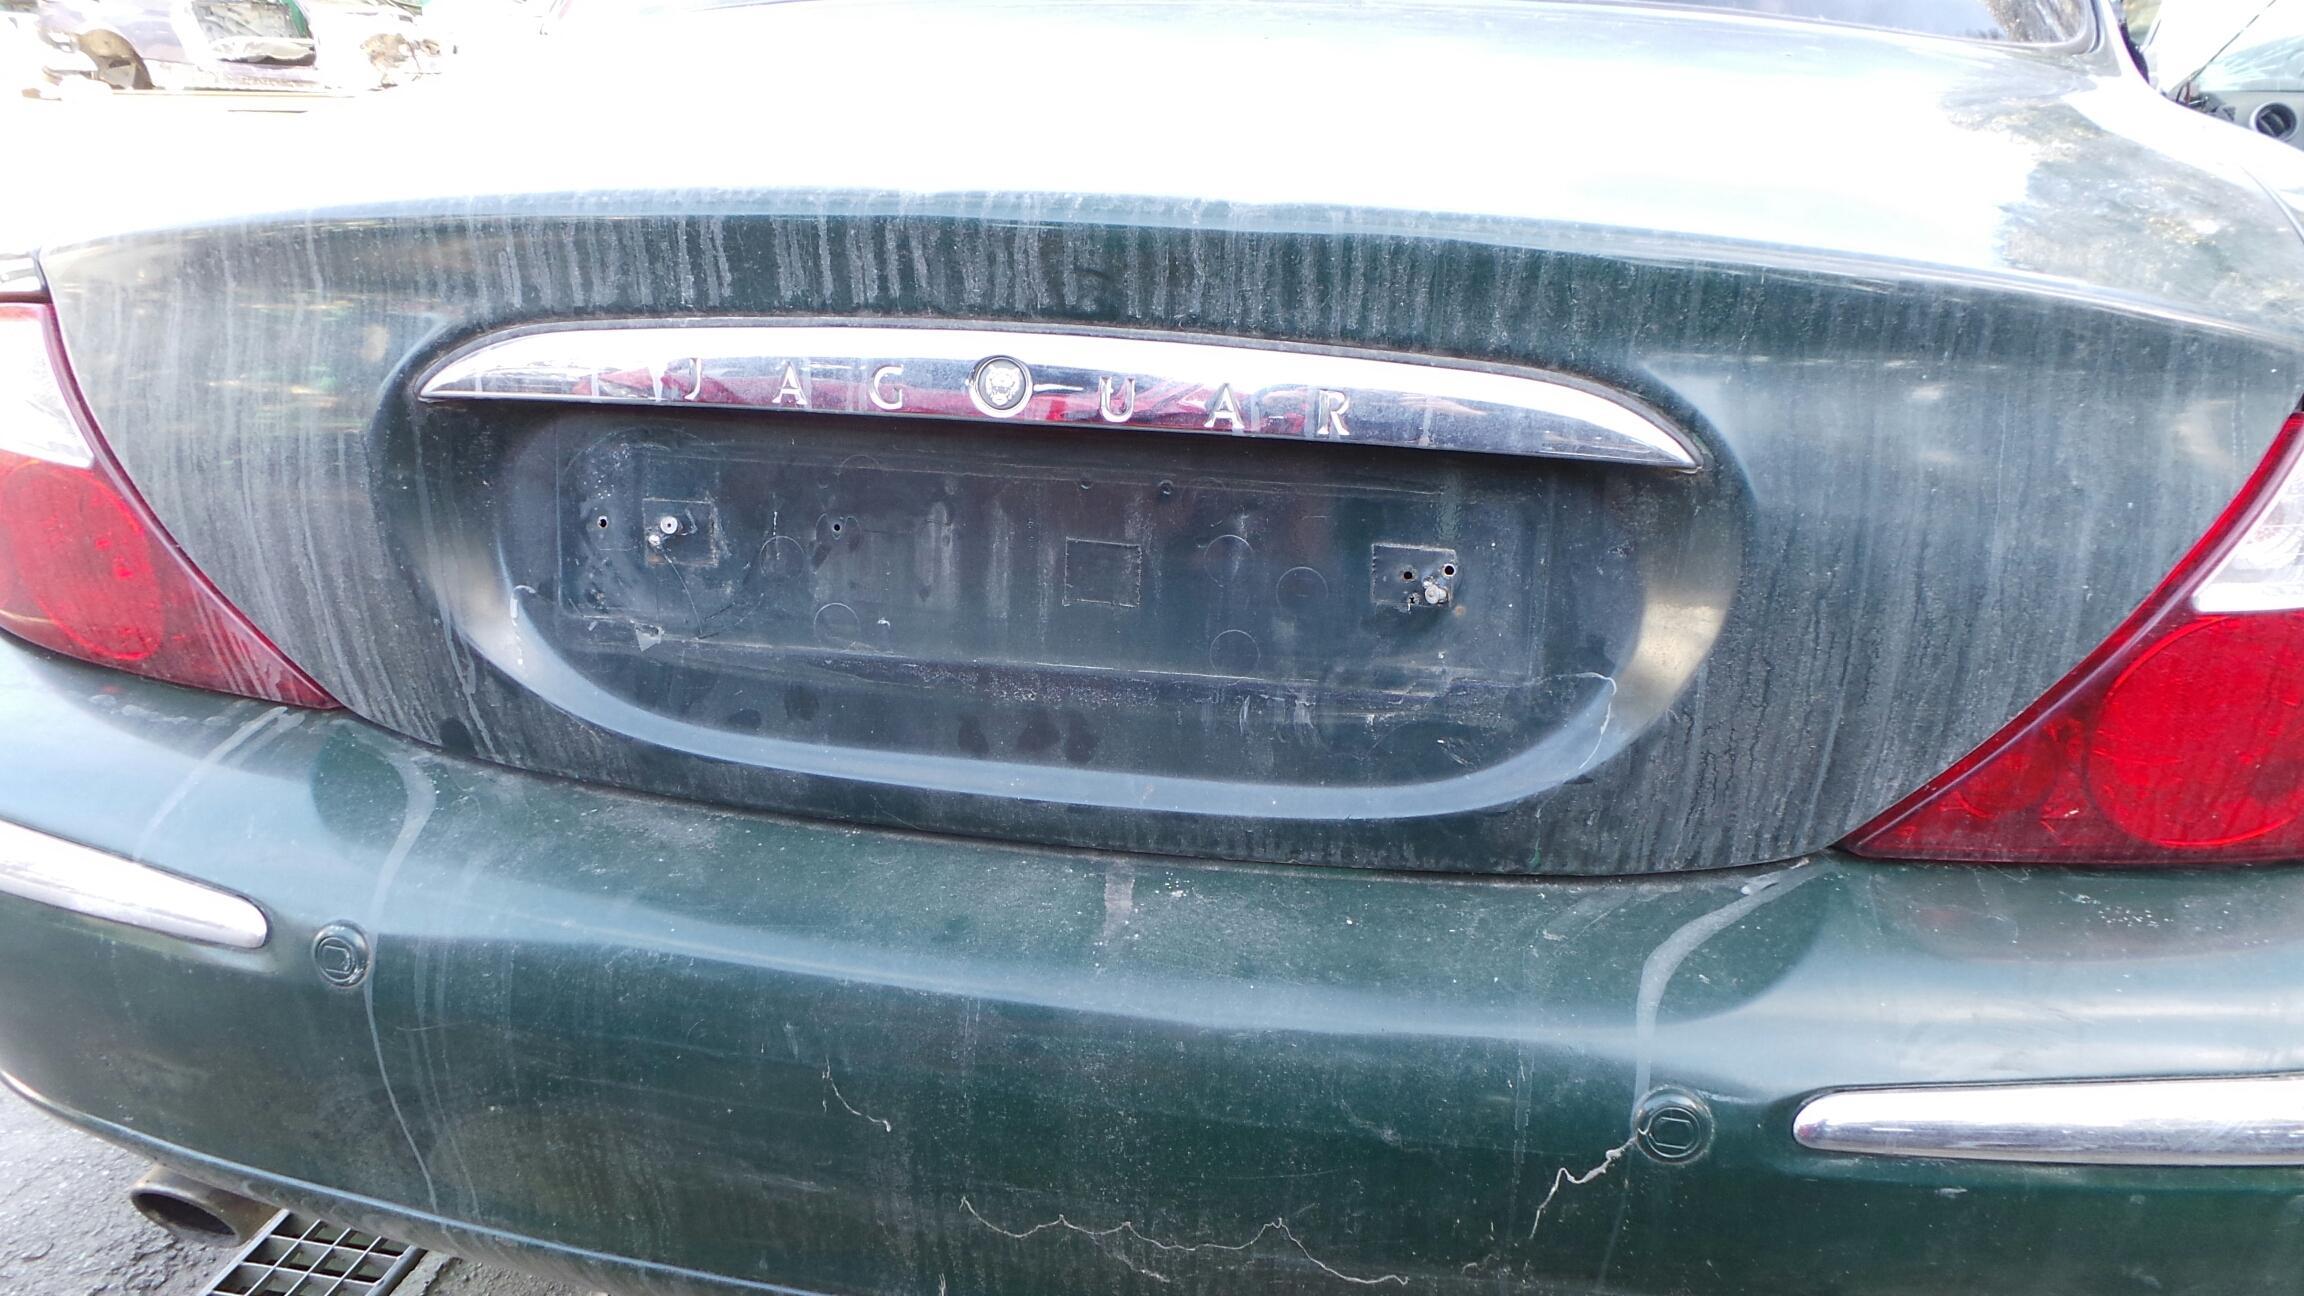 Tampa Da Mala JAGUAR, S TYPE (X200) 3.0 V6(4 Portas ...